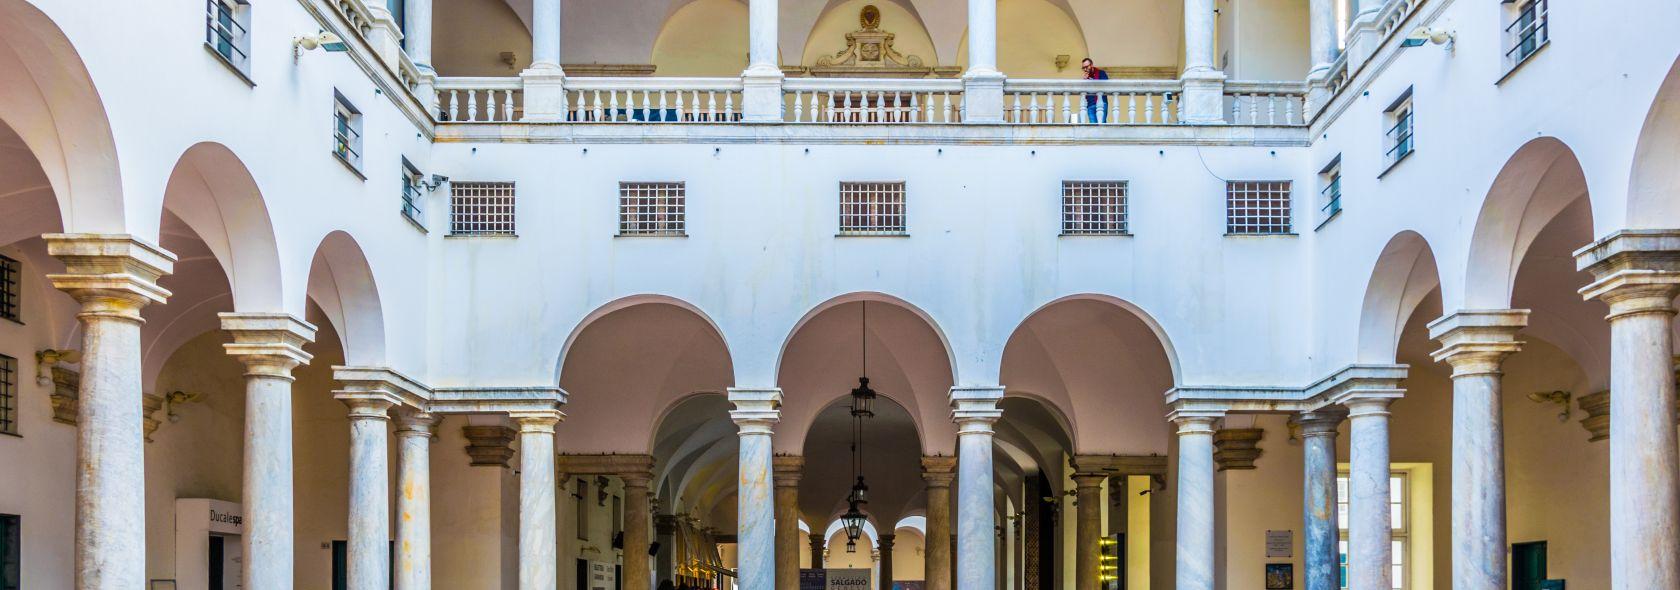 Palazzo Ducale - Cortile